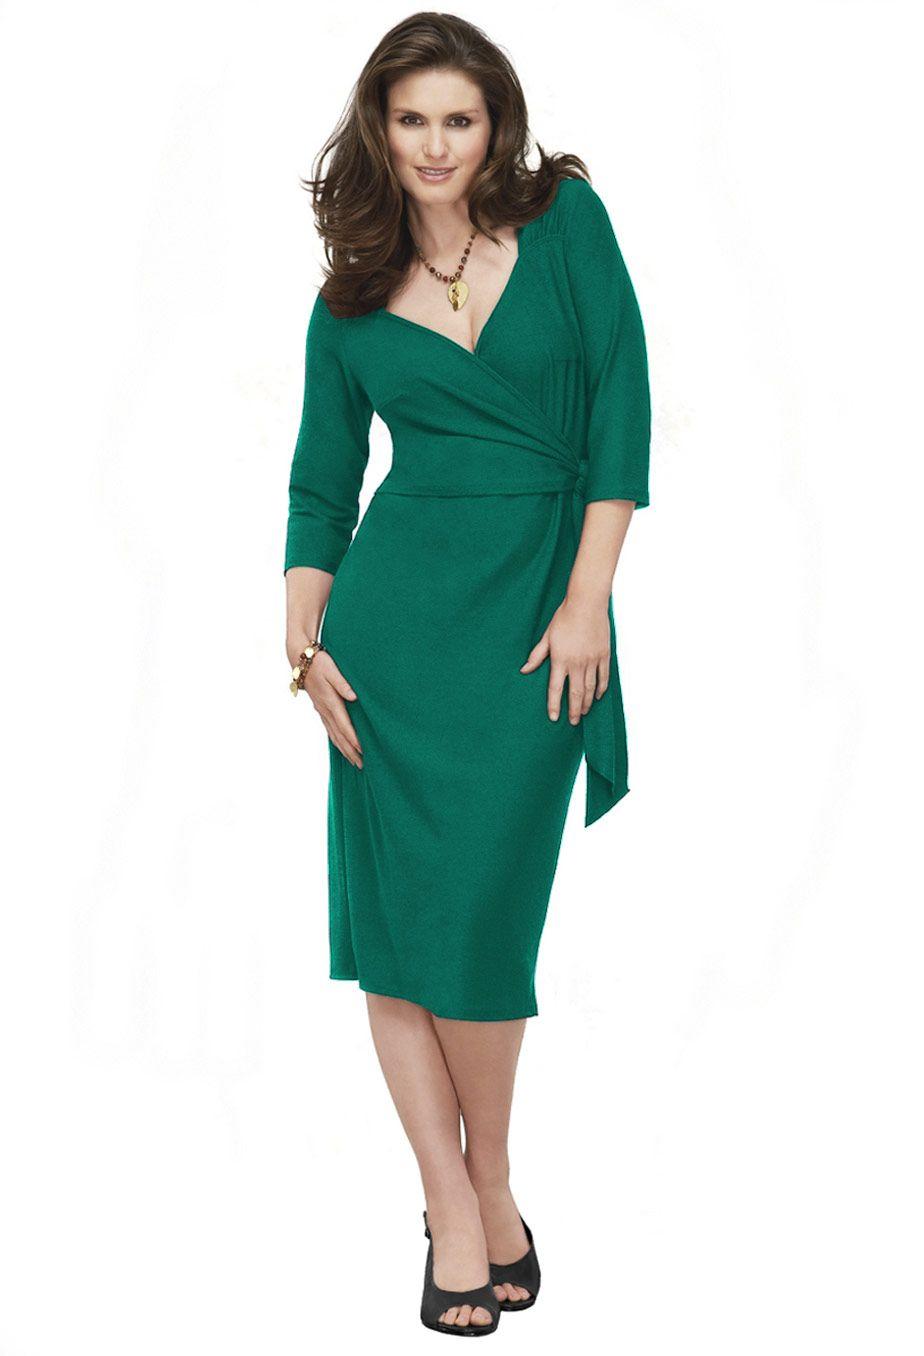 Top Celebrity Fashion Wrap Dresses For Plus Size Women